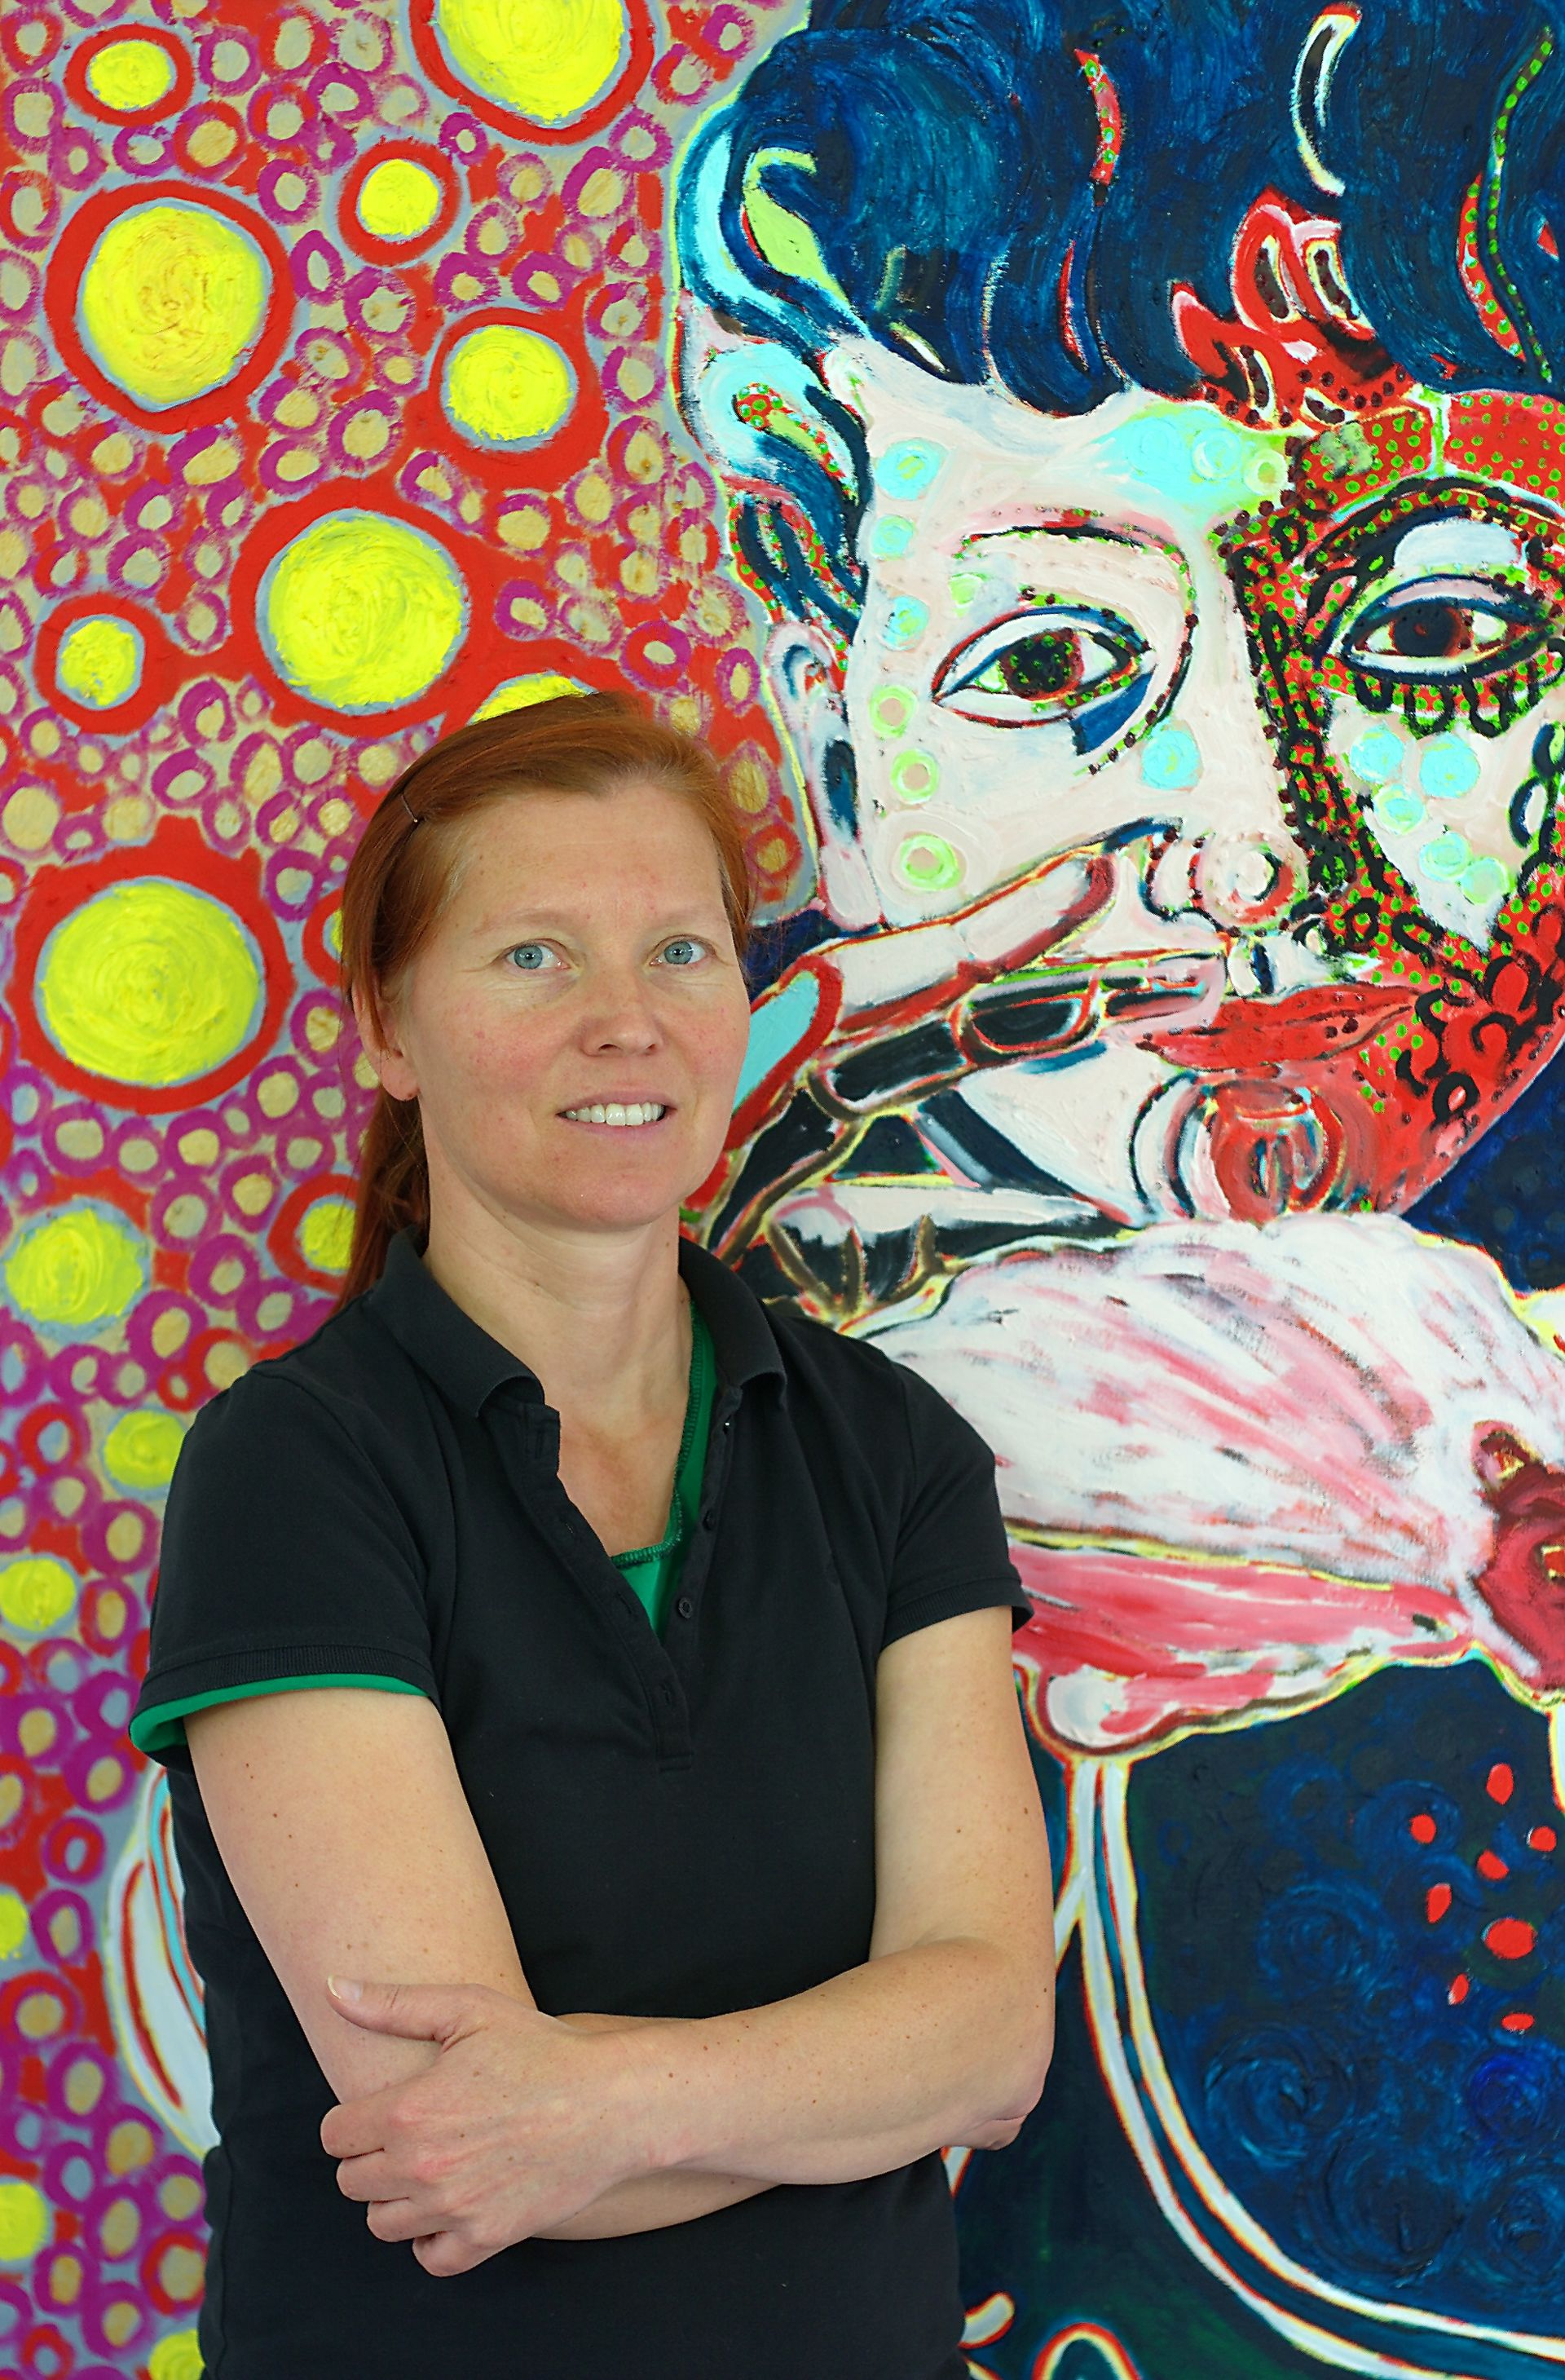 Eva bur am orde wikipedia for Innenarchitektur studium ausland